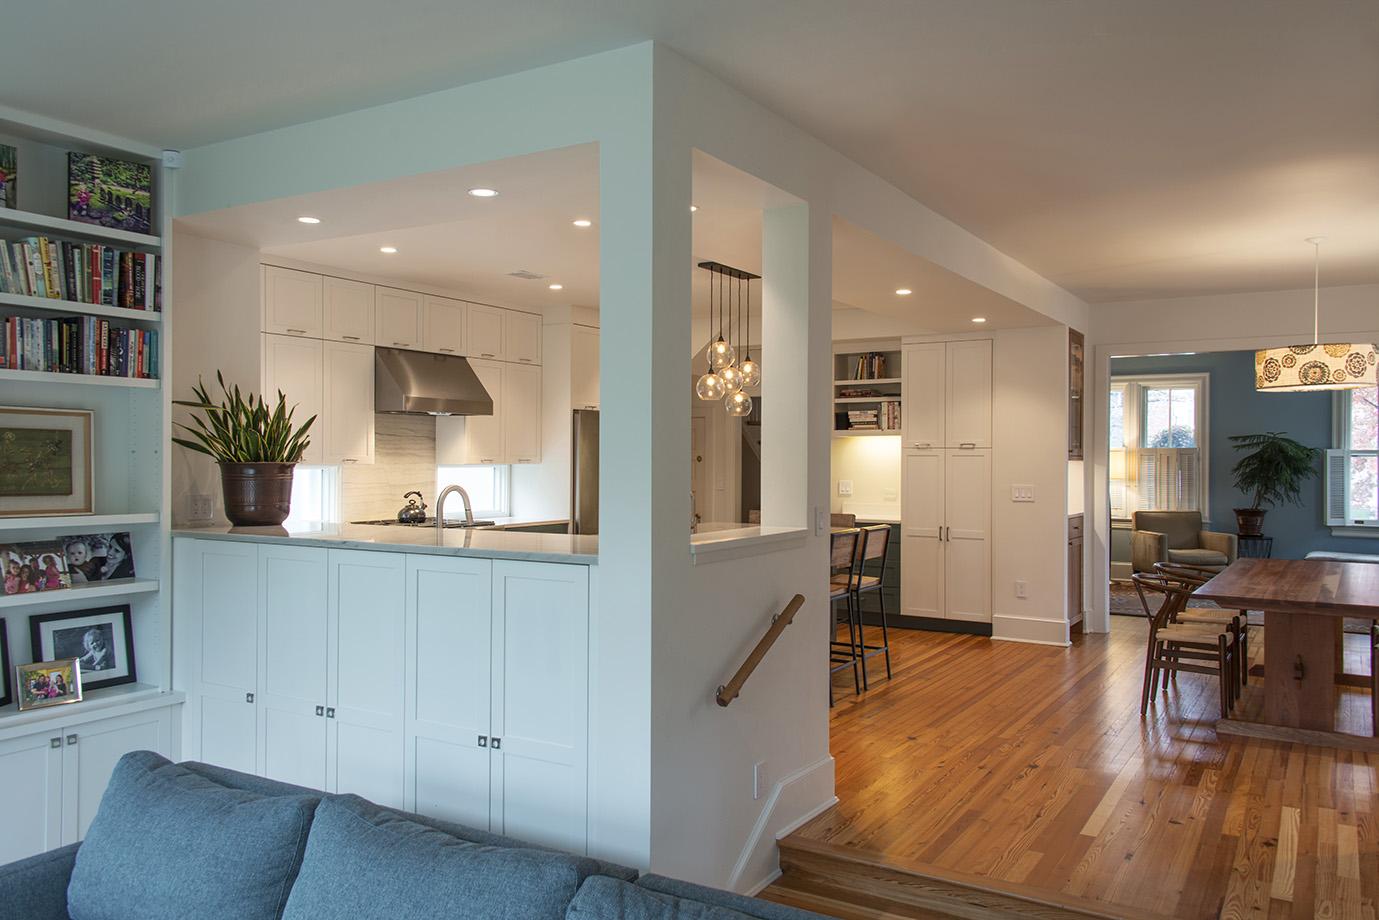 Split level kitchen to living room creates a nice blended separation